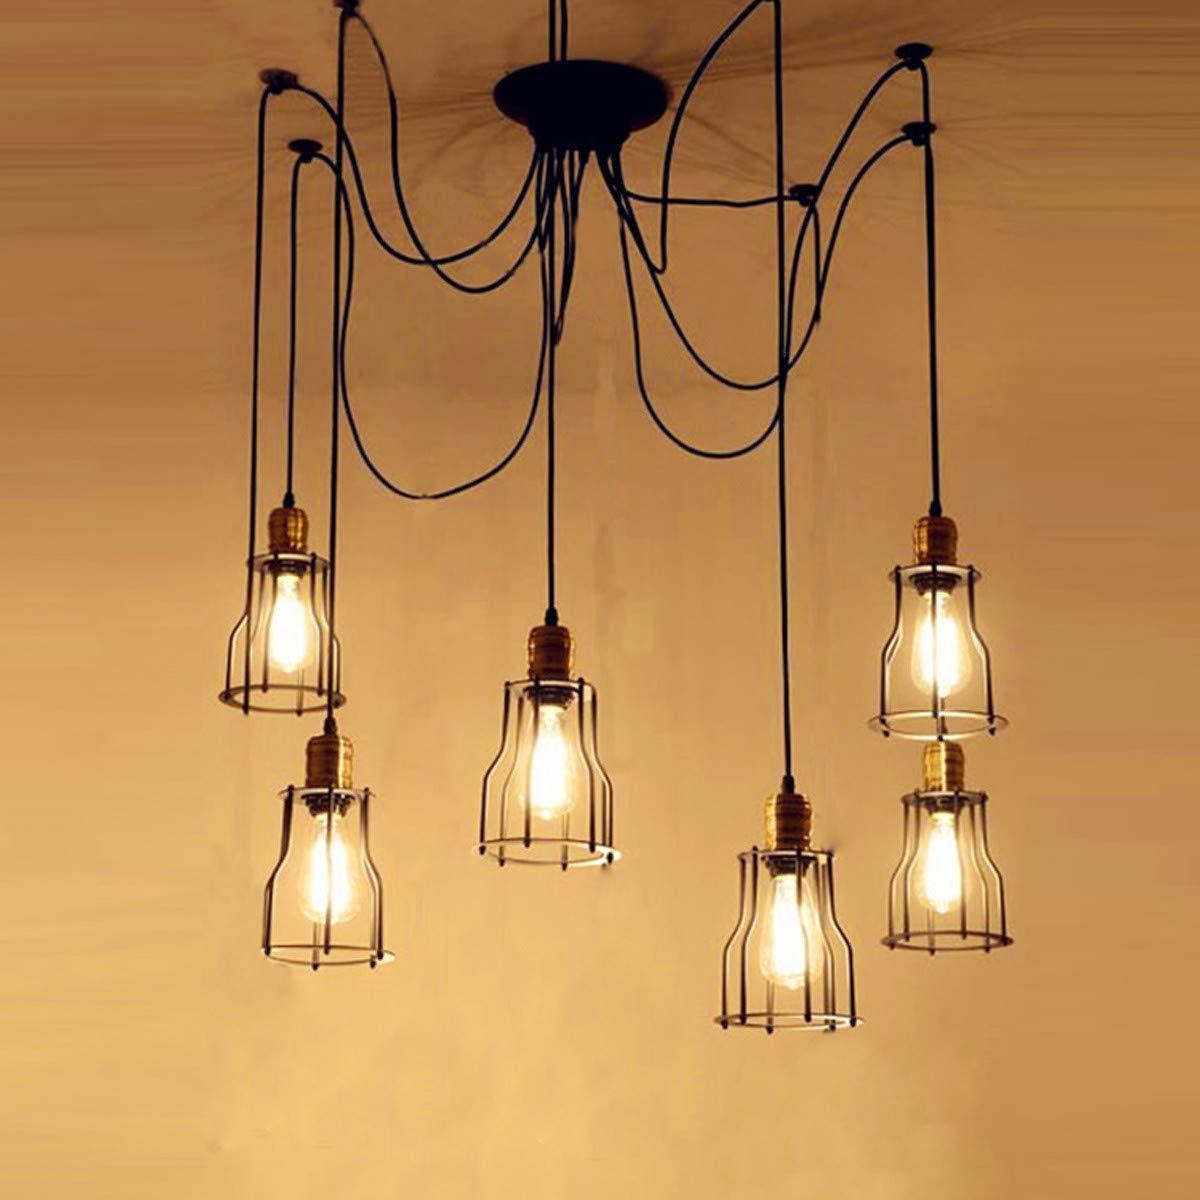 NANGE Vintage Chandelier,Edison Multiple Adjustable DIY Metal Wire Cage Pendant Lighting,Modern Chic Industrial Dining Light,E27(Without Light Source) (Color : Warm White, Size : AC 220V) by NANGE (Image #4)